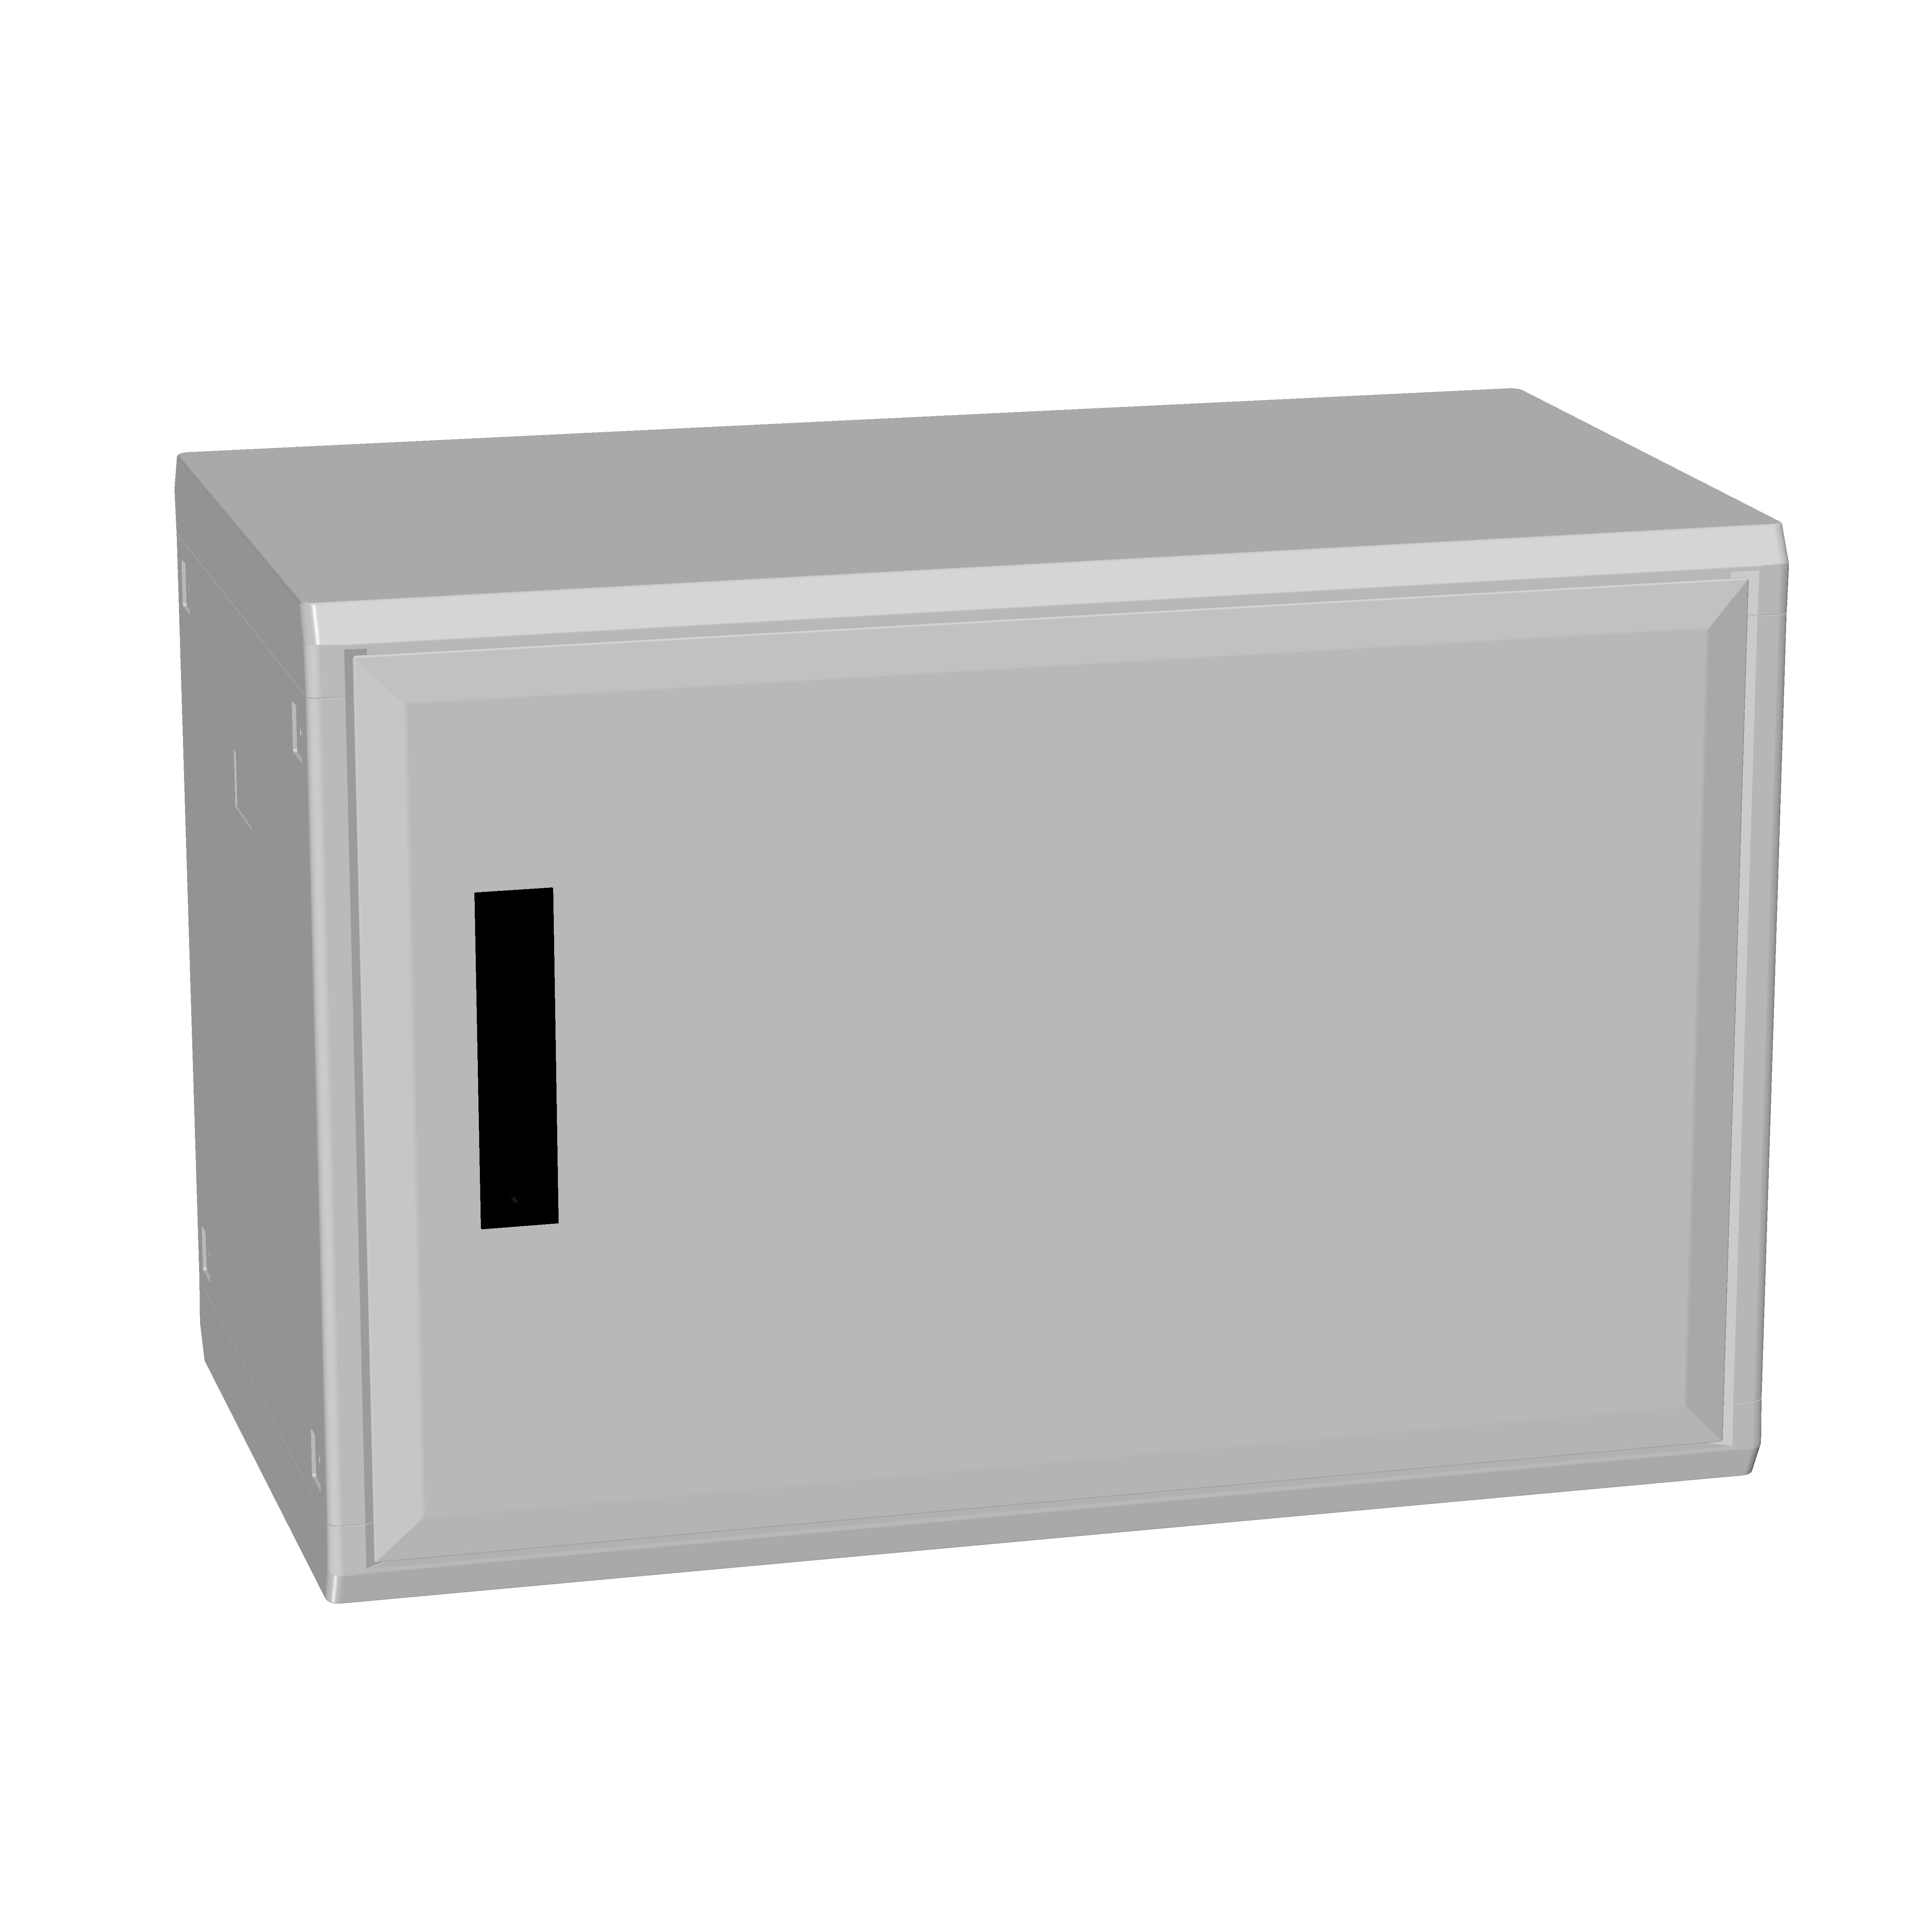 1 Stk Polyesterschrank, eintürig, 500x750x432 POCC2340--